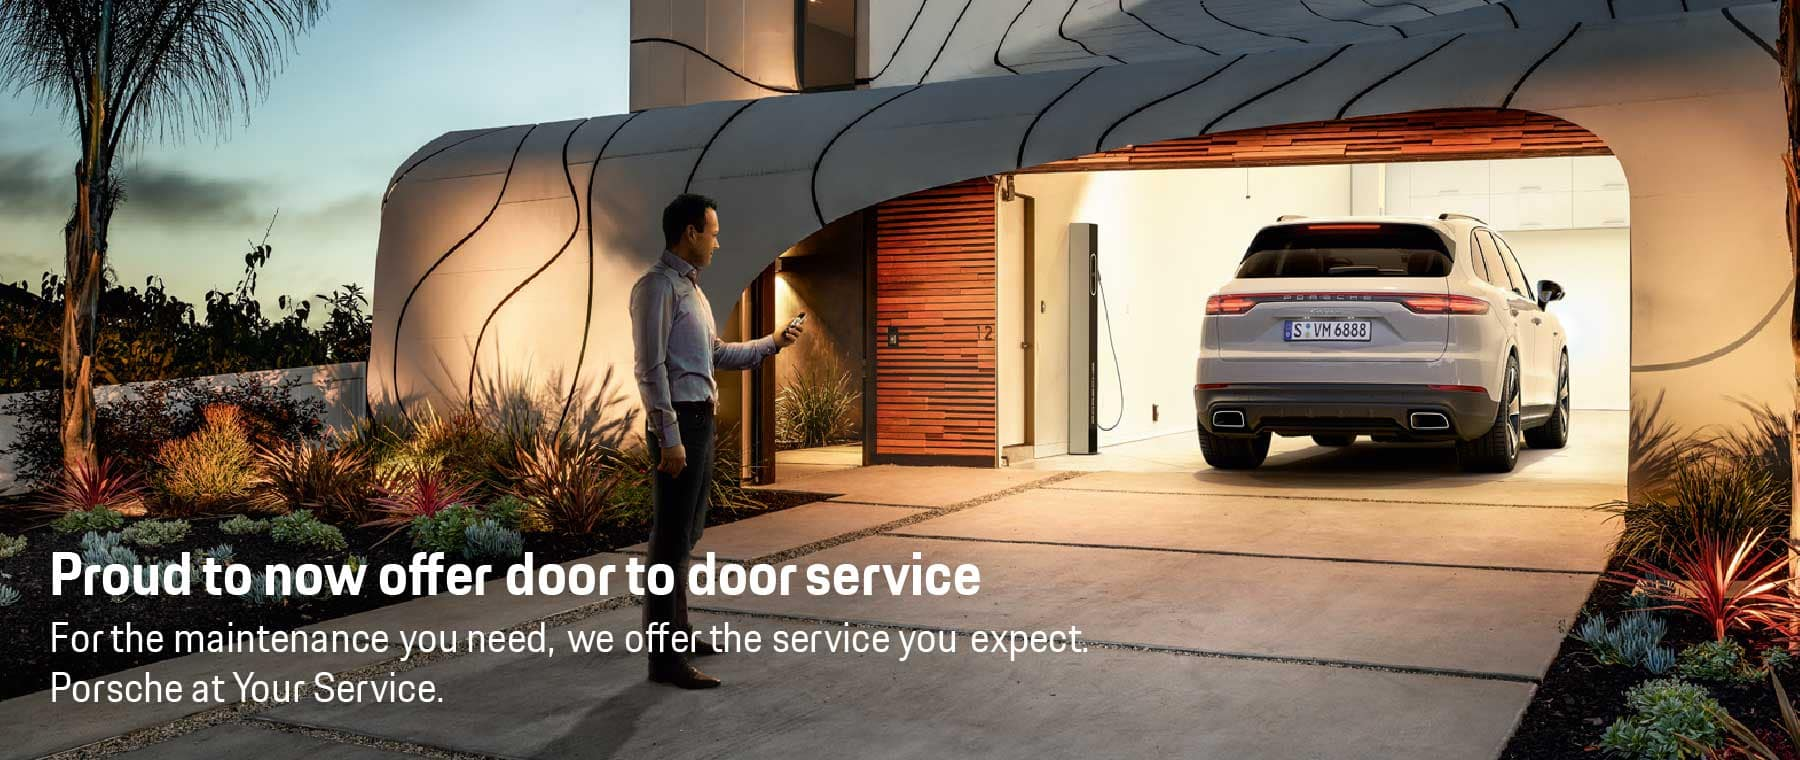 Porsche-at-your-service-DI